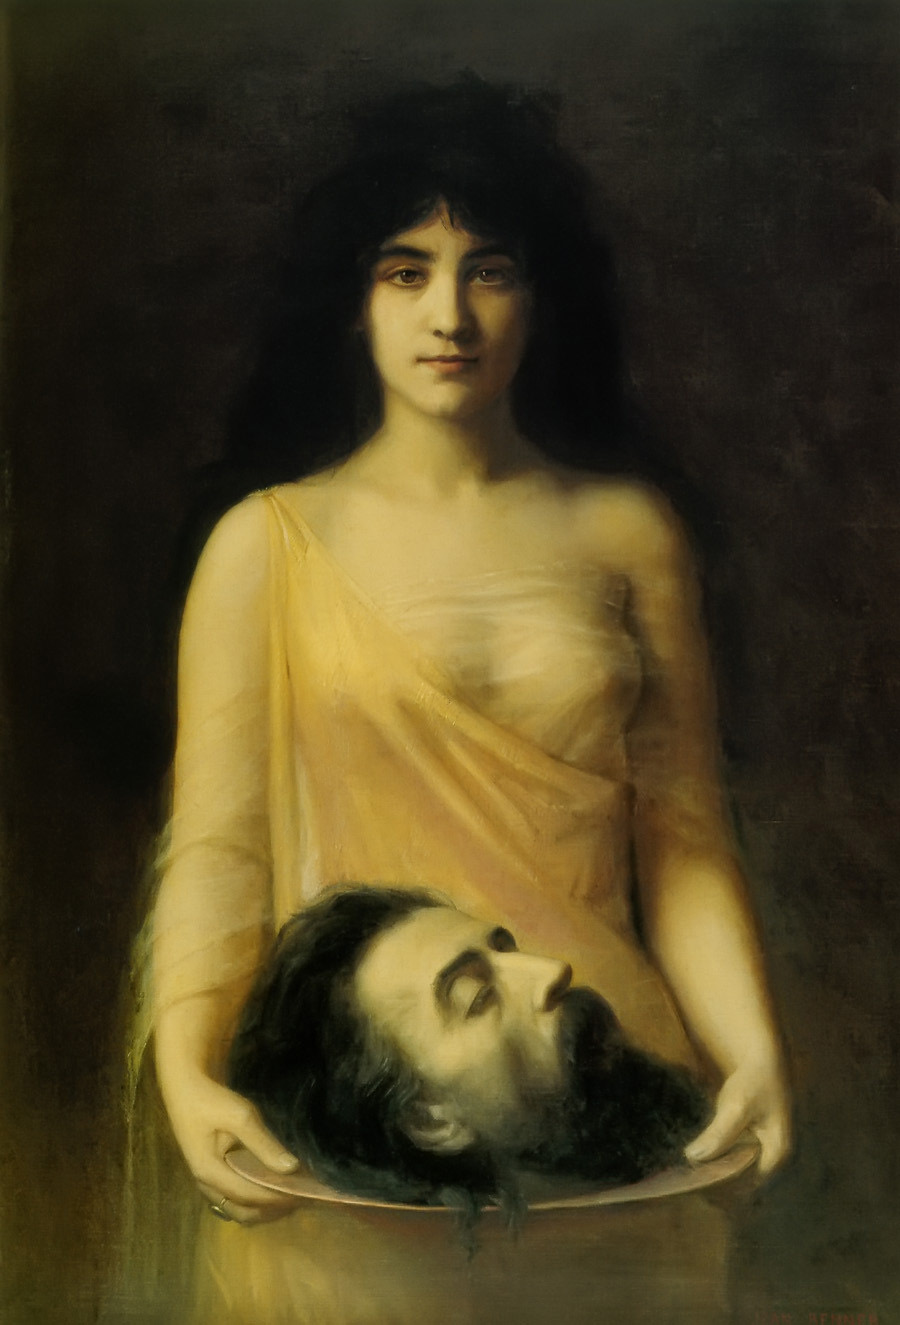 Salomé, de Jean Benner, h. 1889.